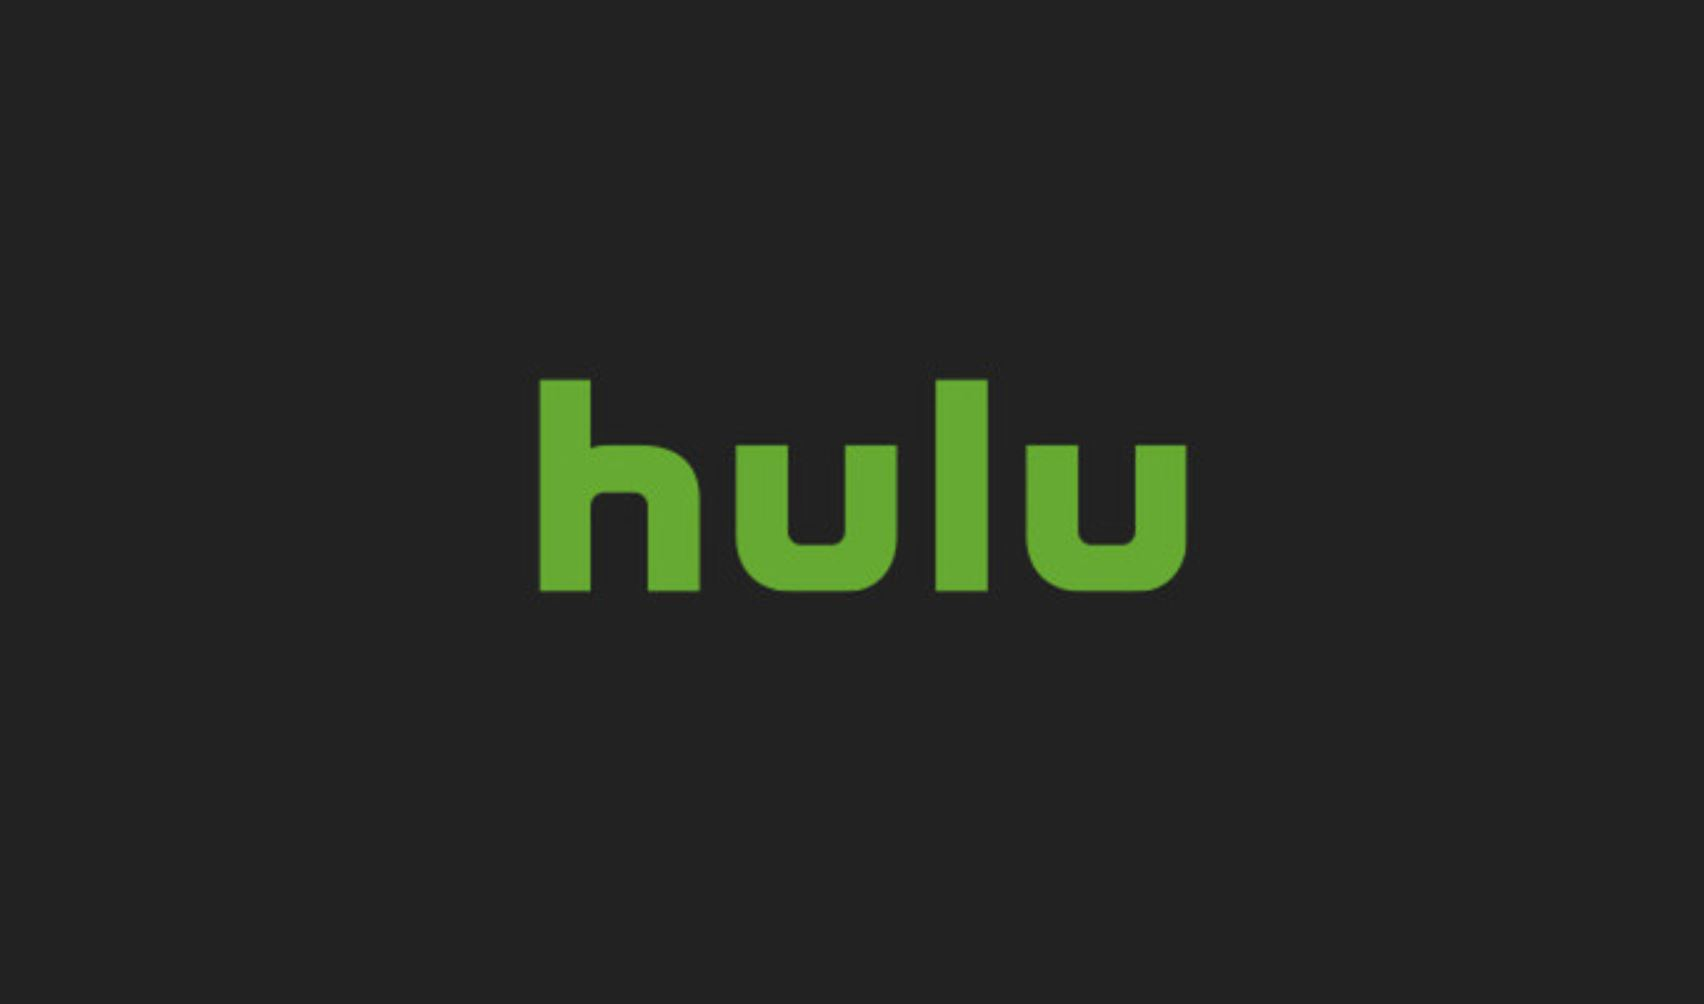 Huluにiphoneでの登録方法を画像で説明!入会の注意点やおすすめ理由も